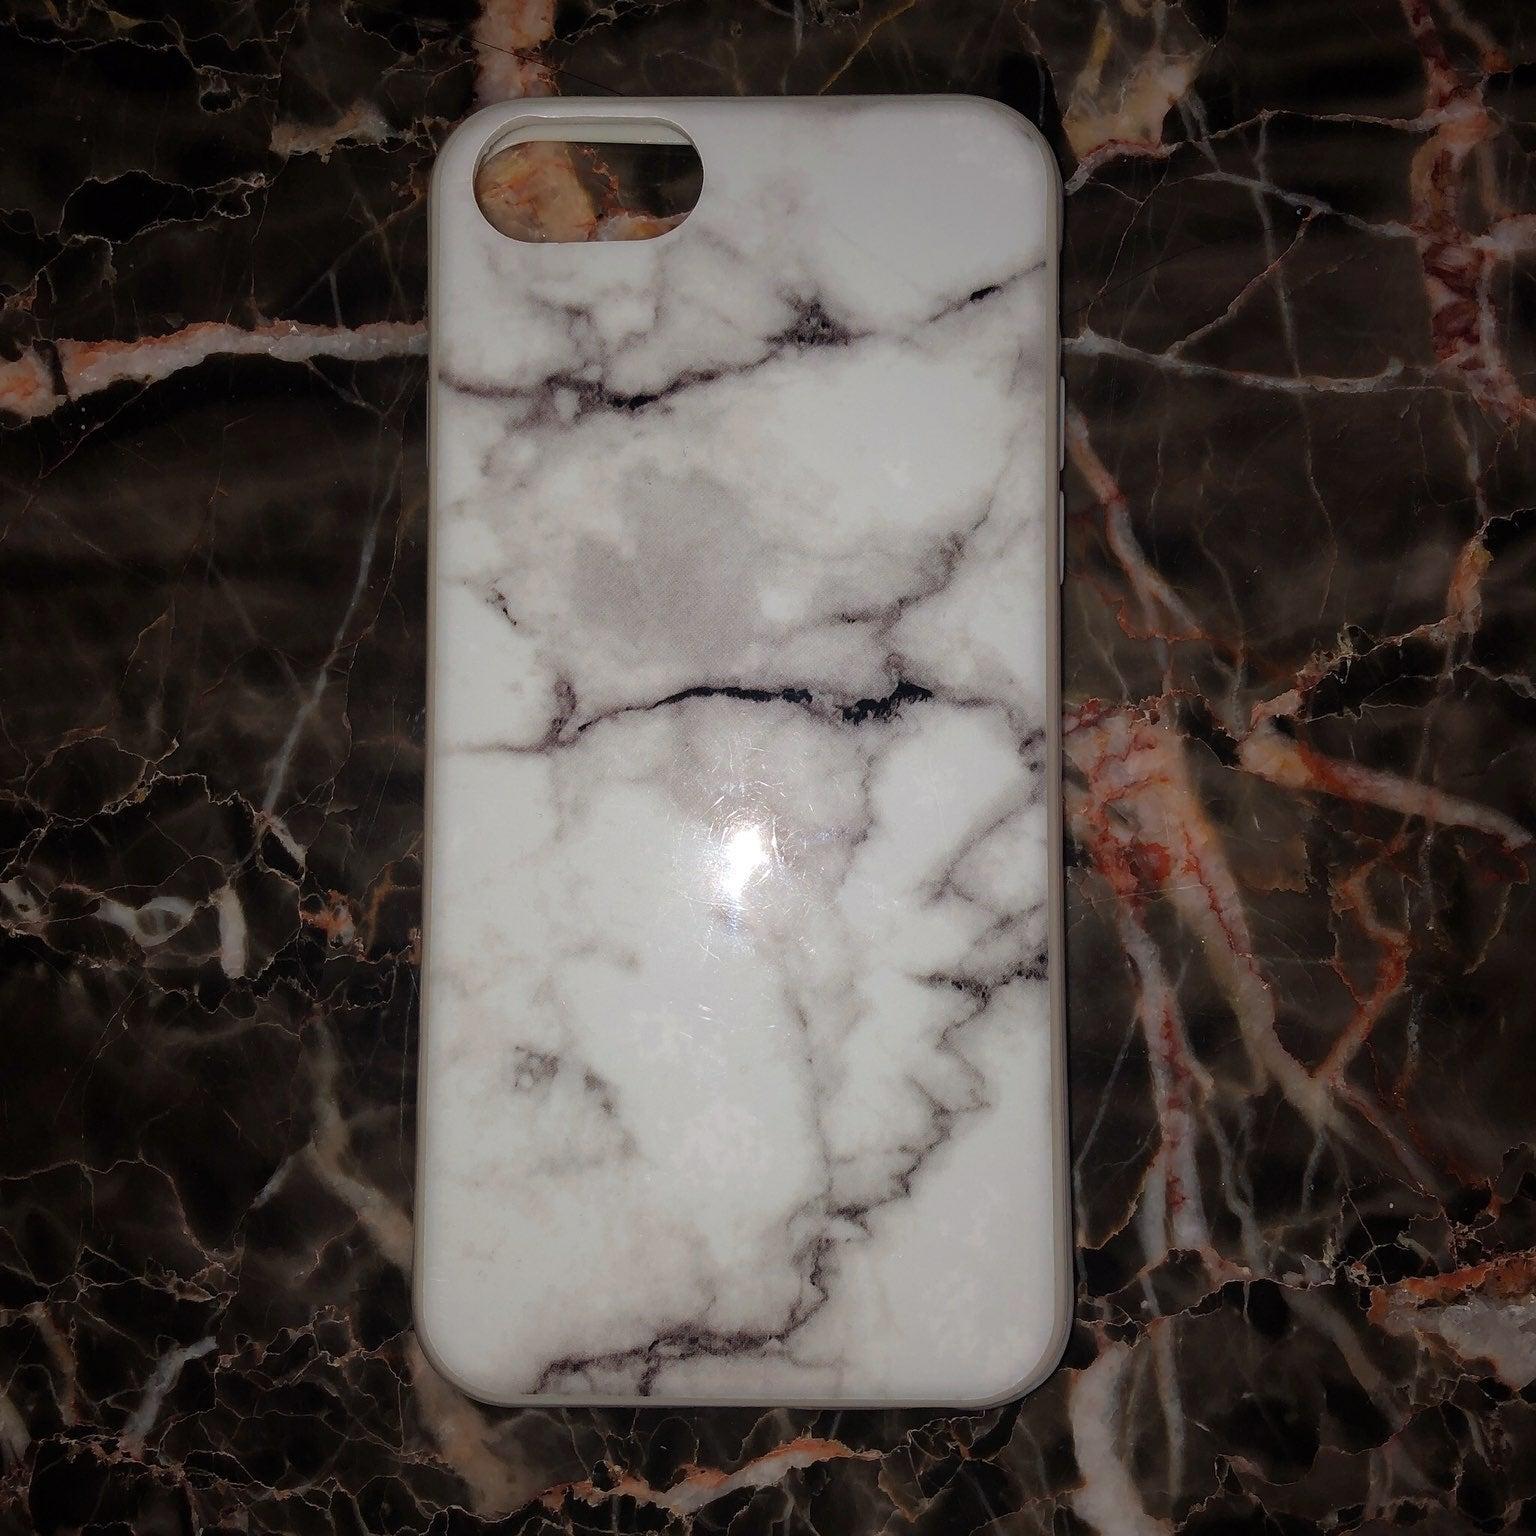 marble bumper iphone 6/7/8 case